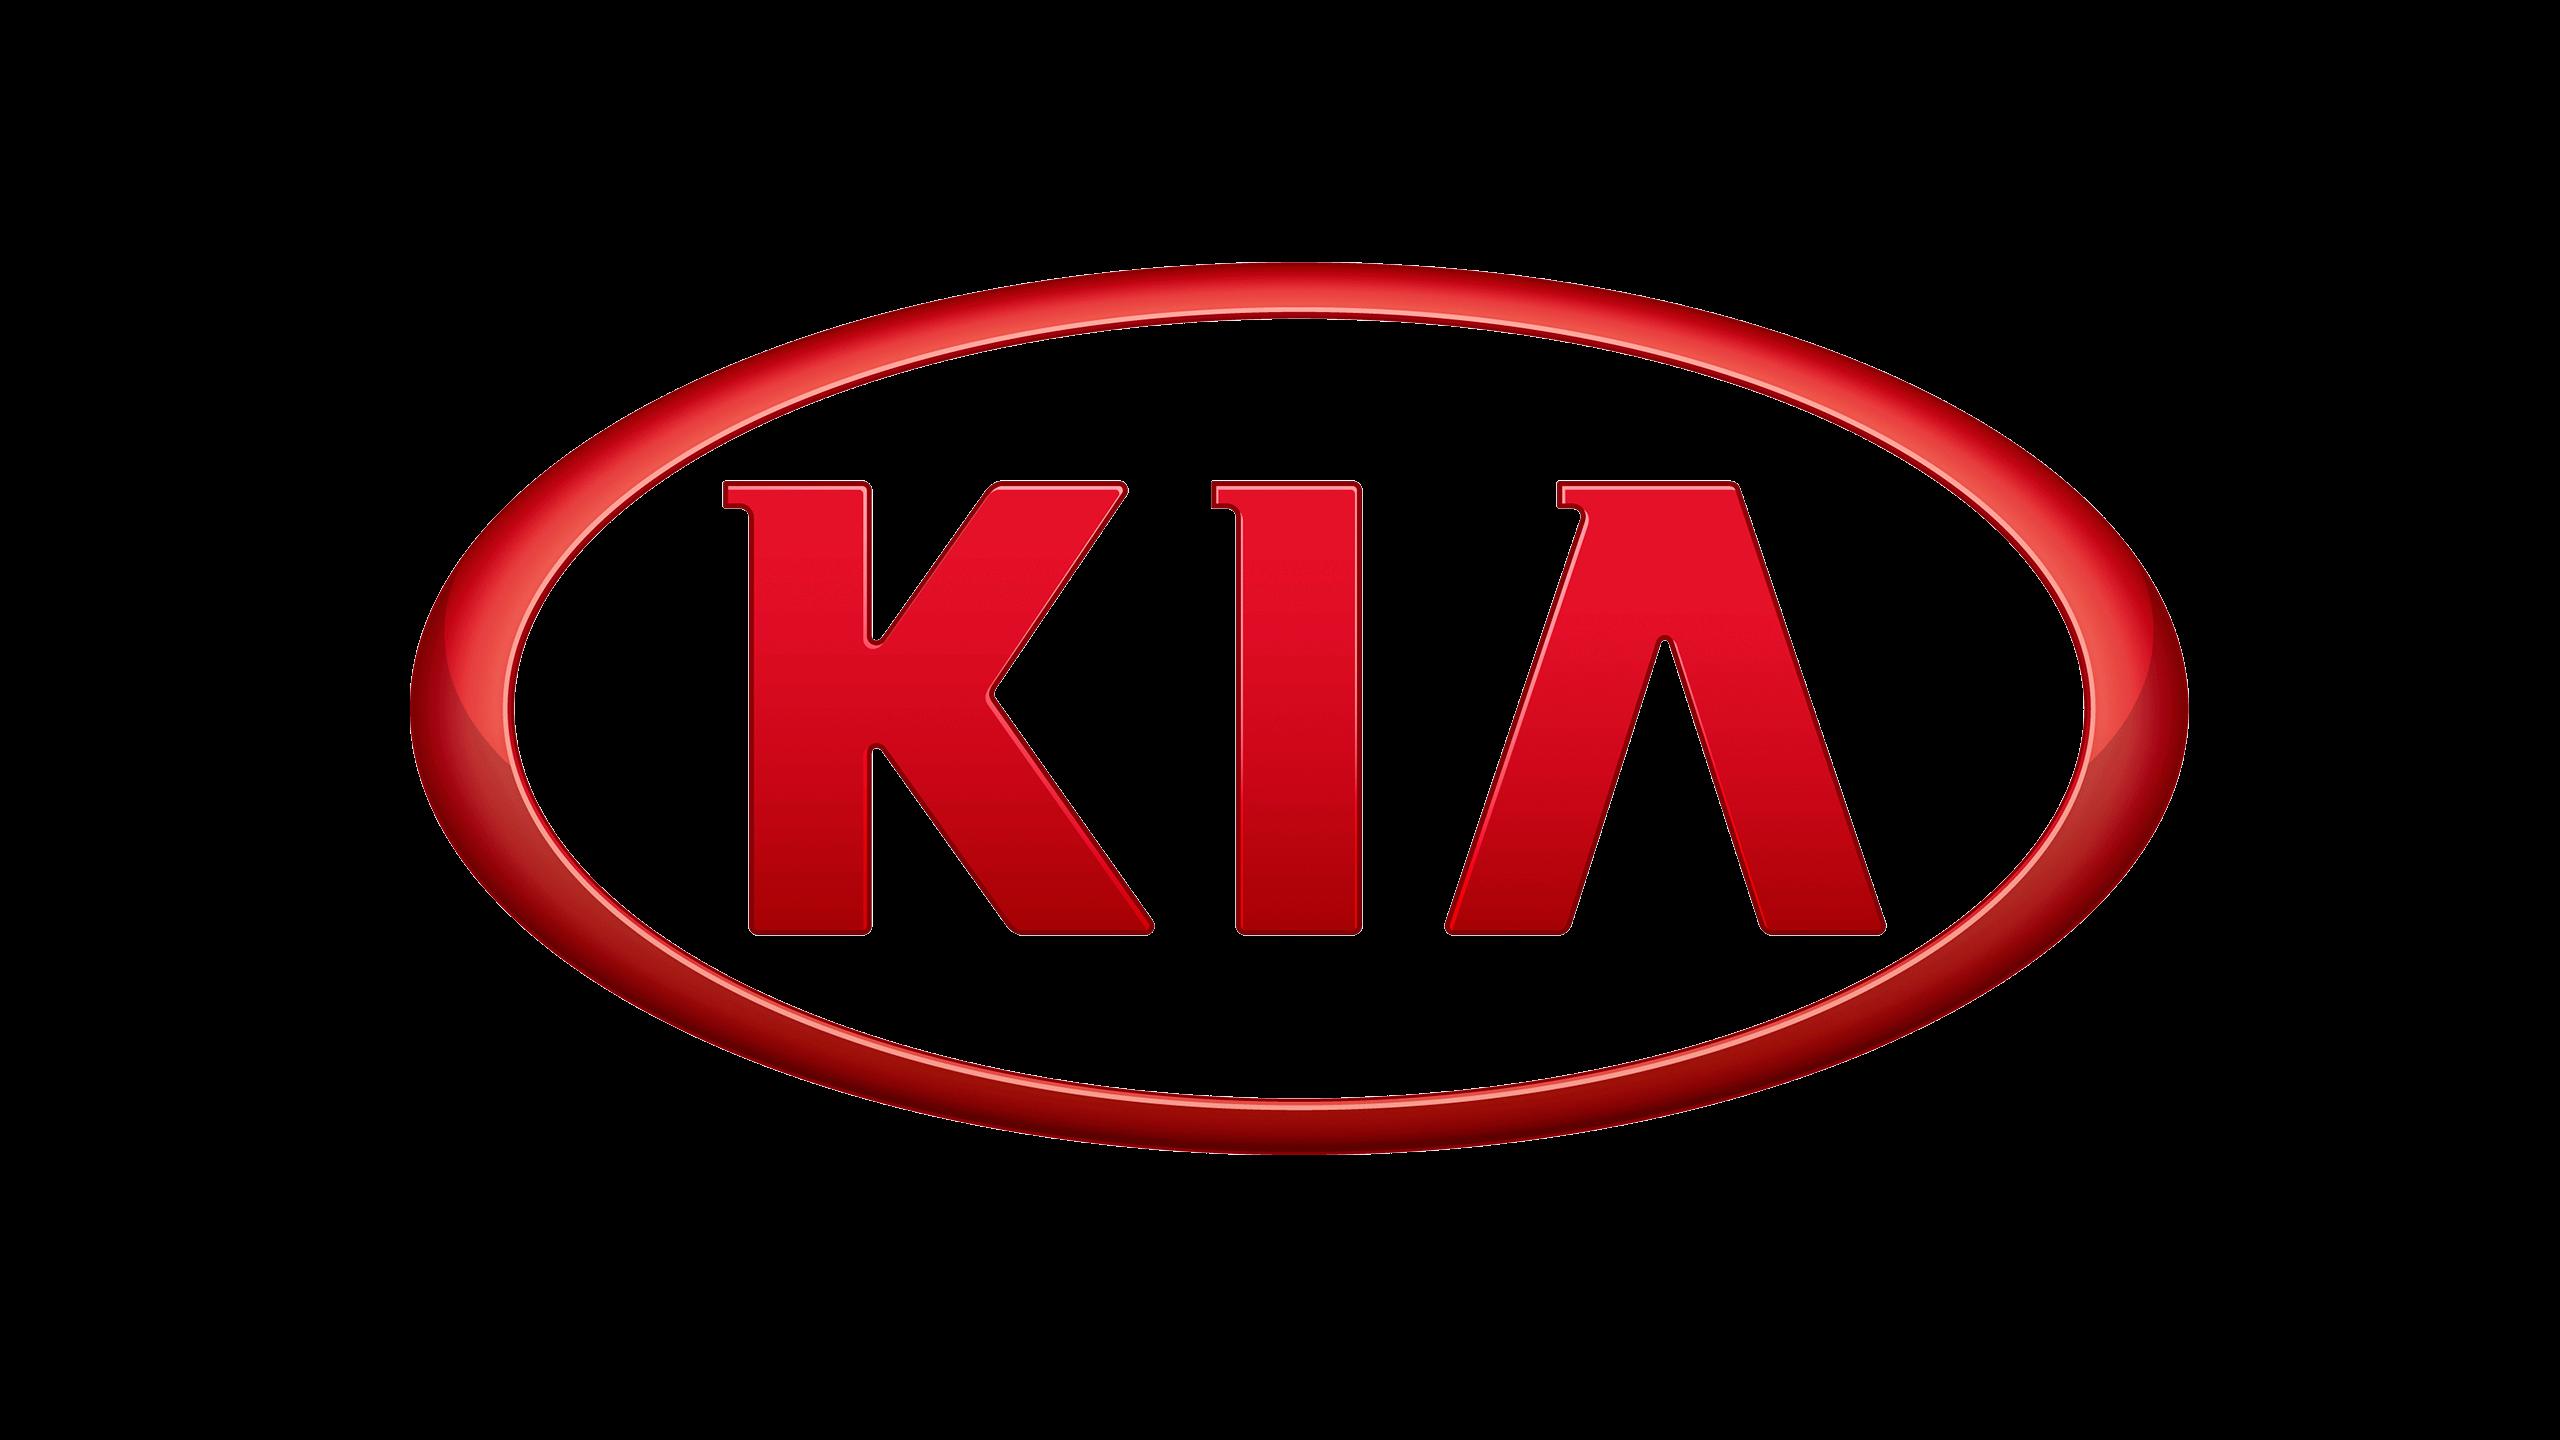 Car Logo Kia - Car, Transparent background PNG HD thumbnail